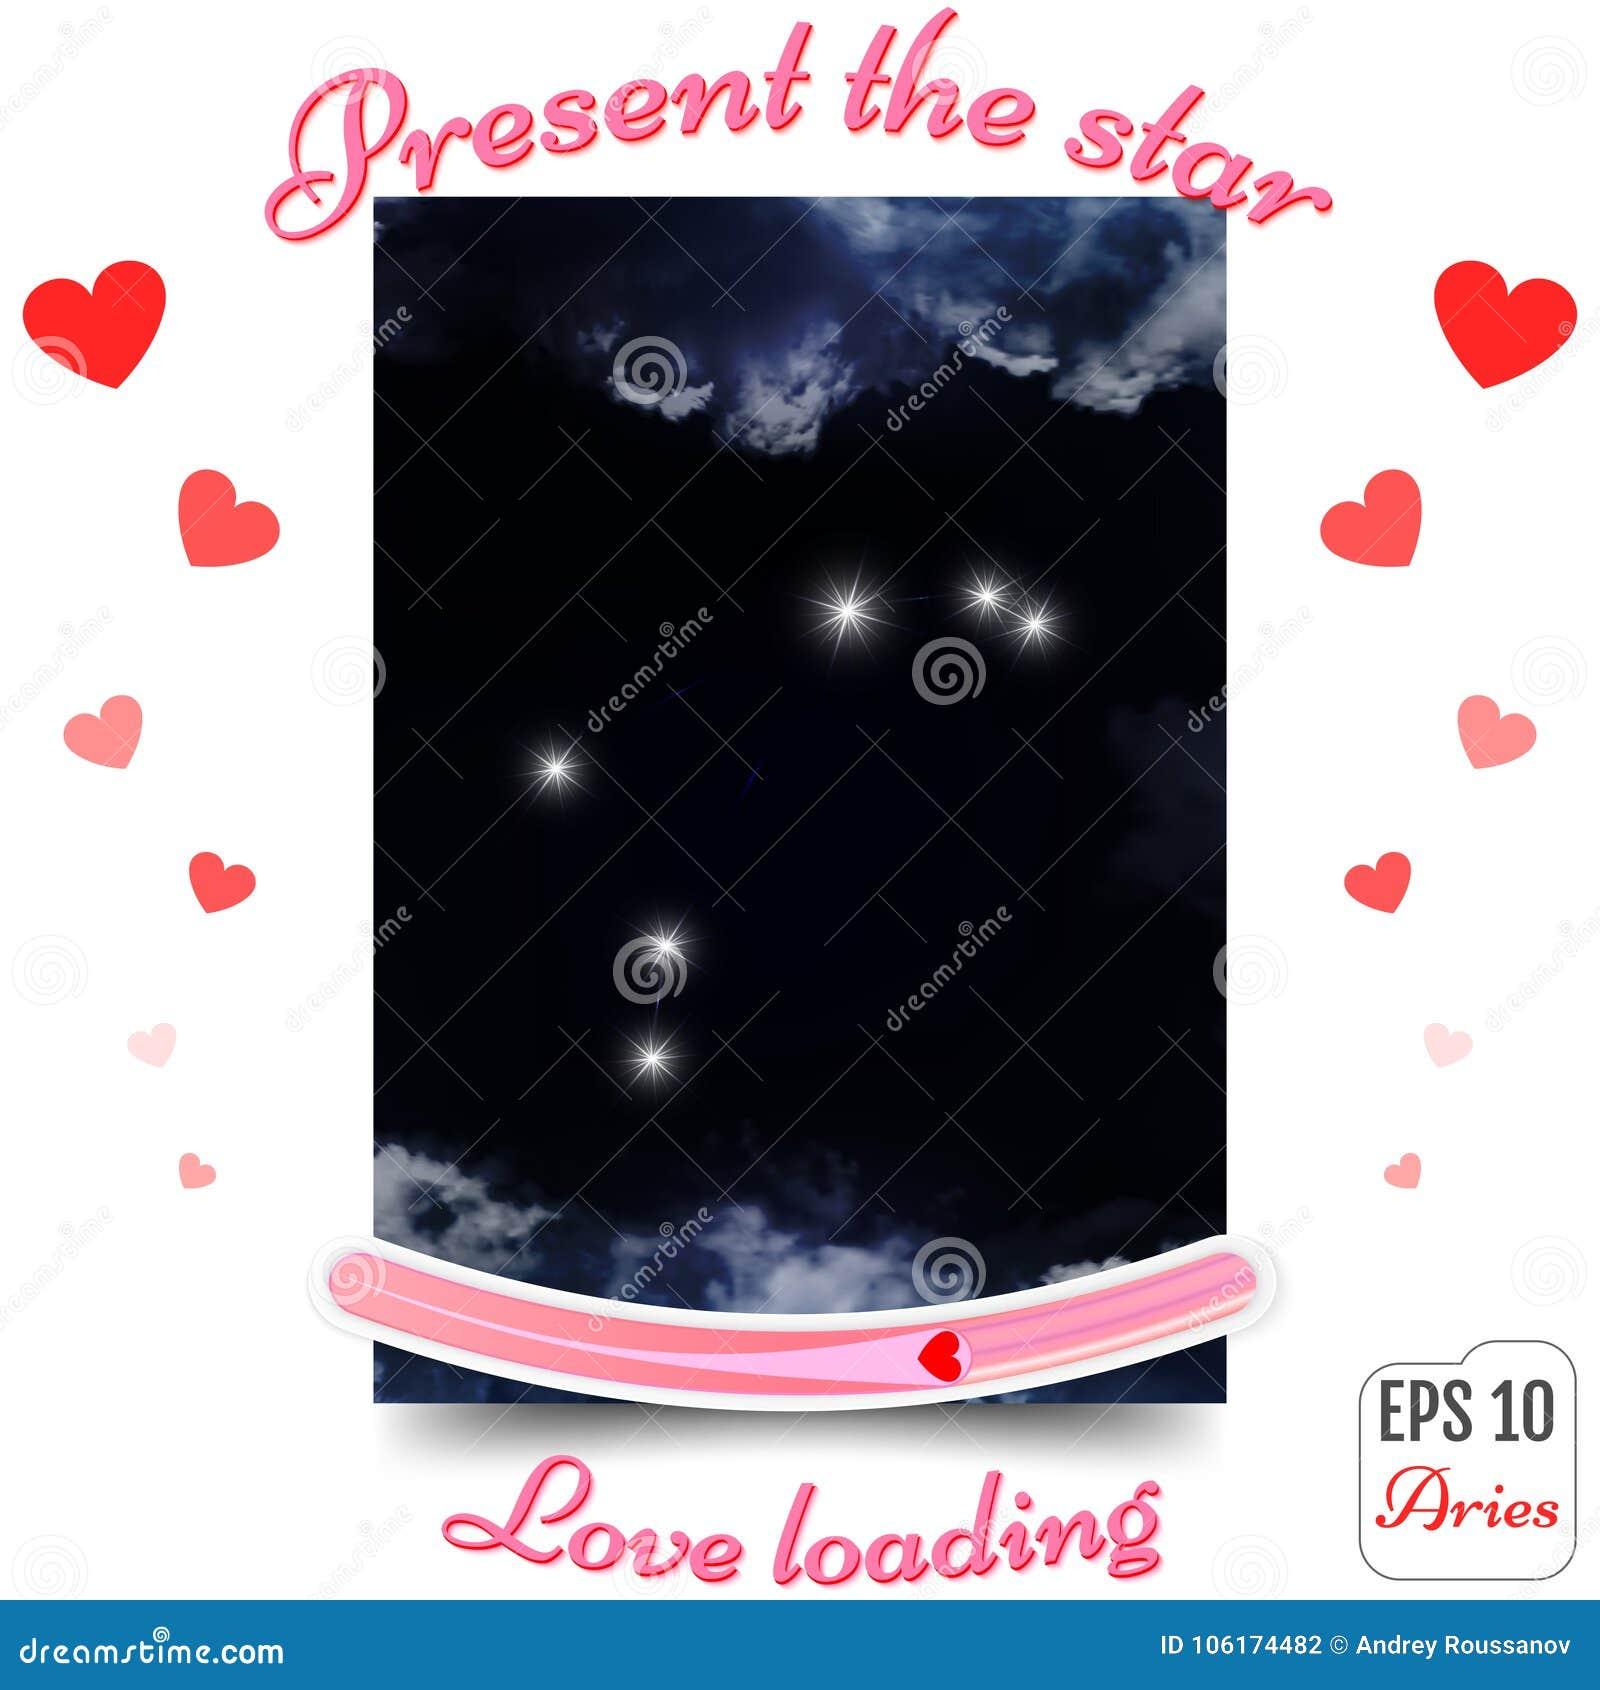 Aries Zodiac Sign  Aries Horoscope Constellation, Stars  Present